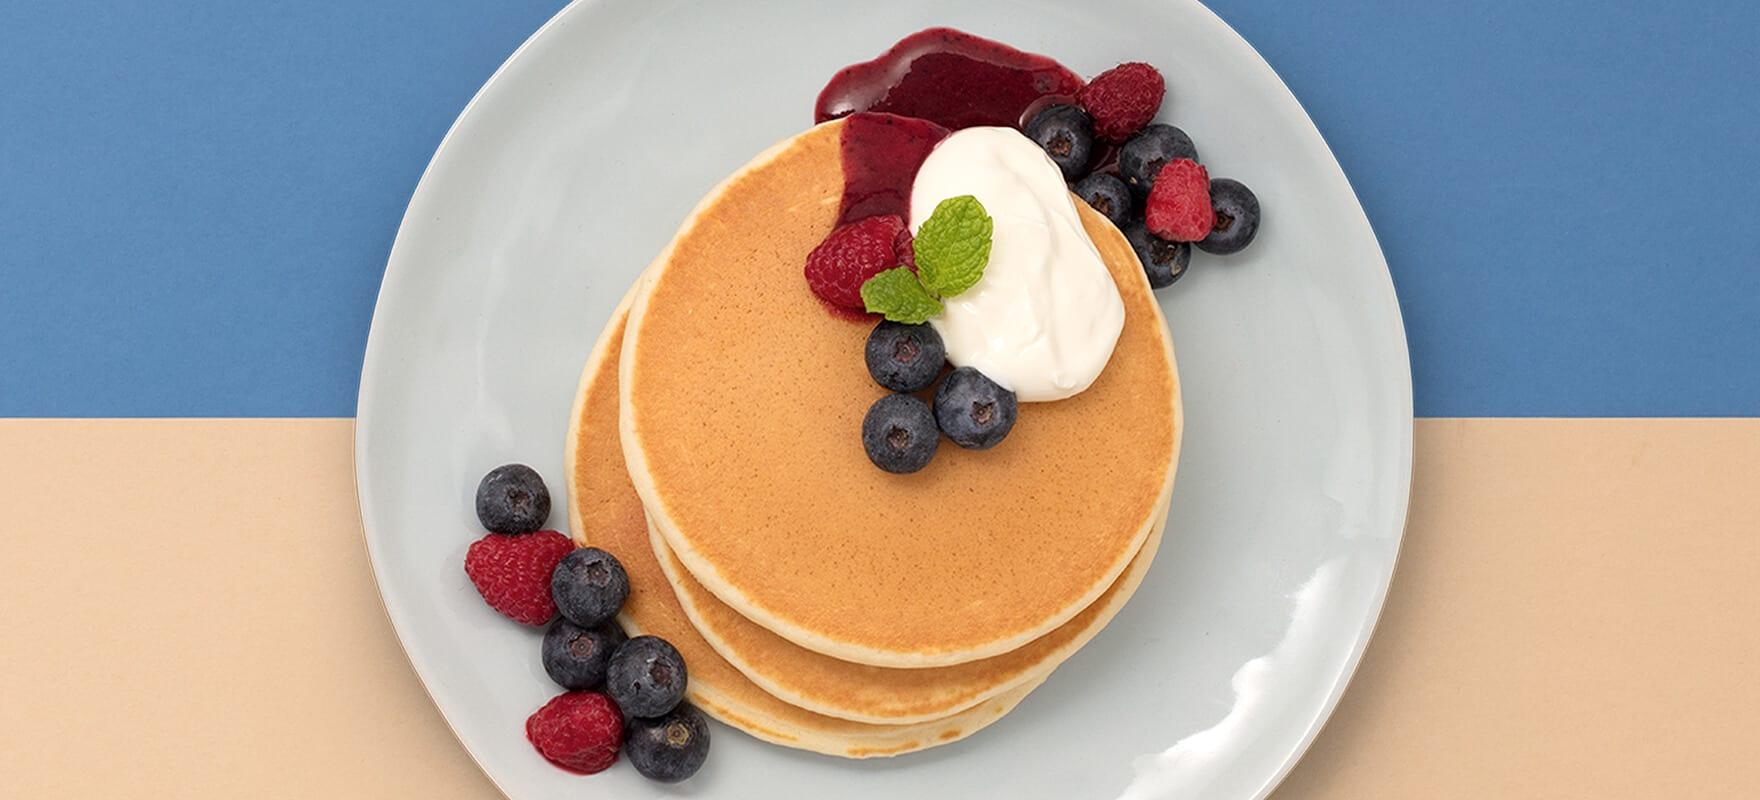 Oat milk pancakes image 1